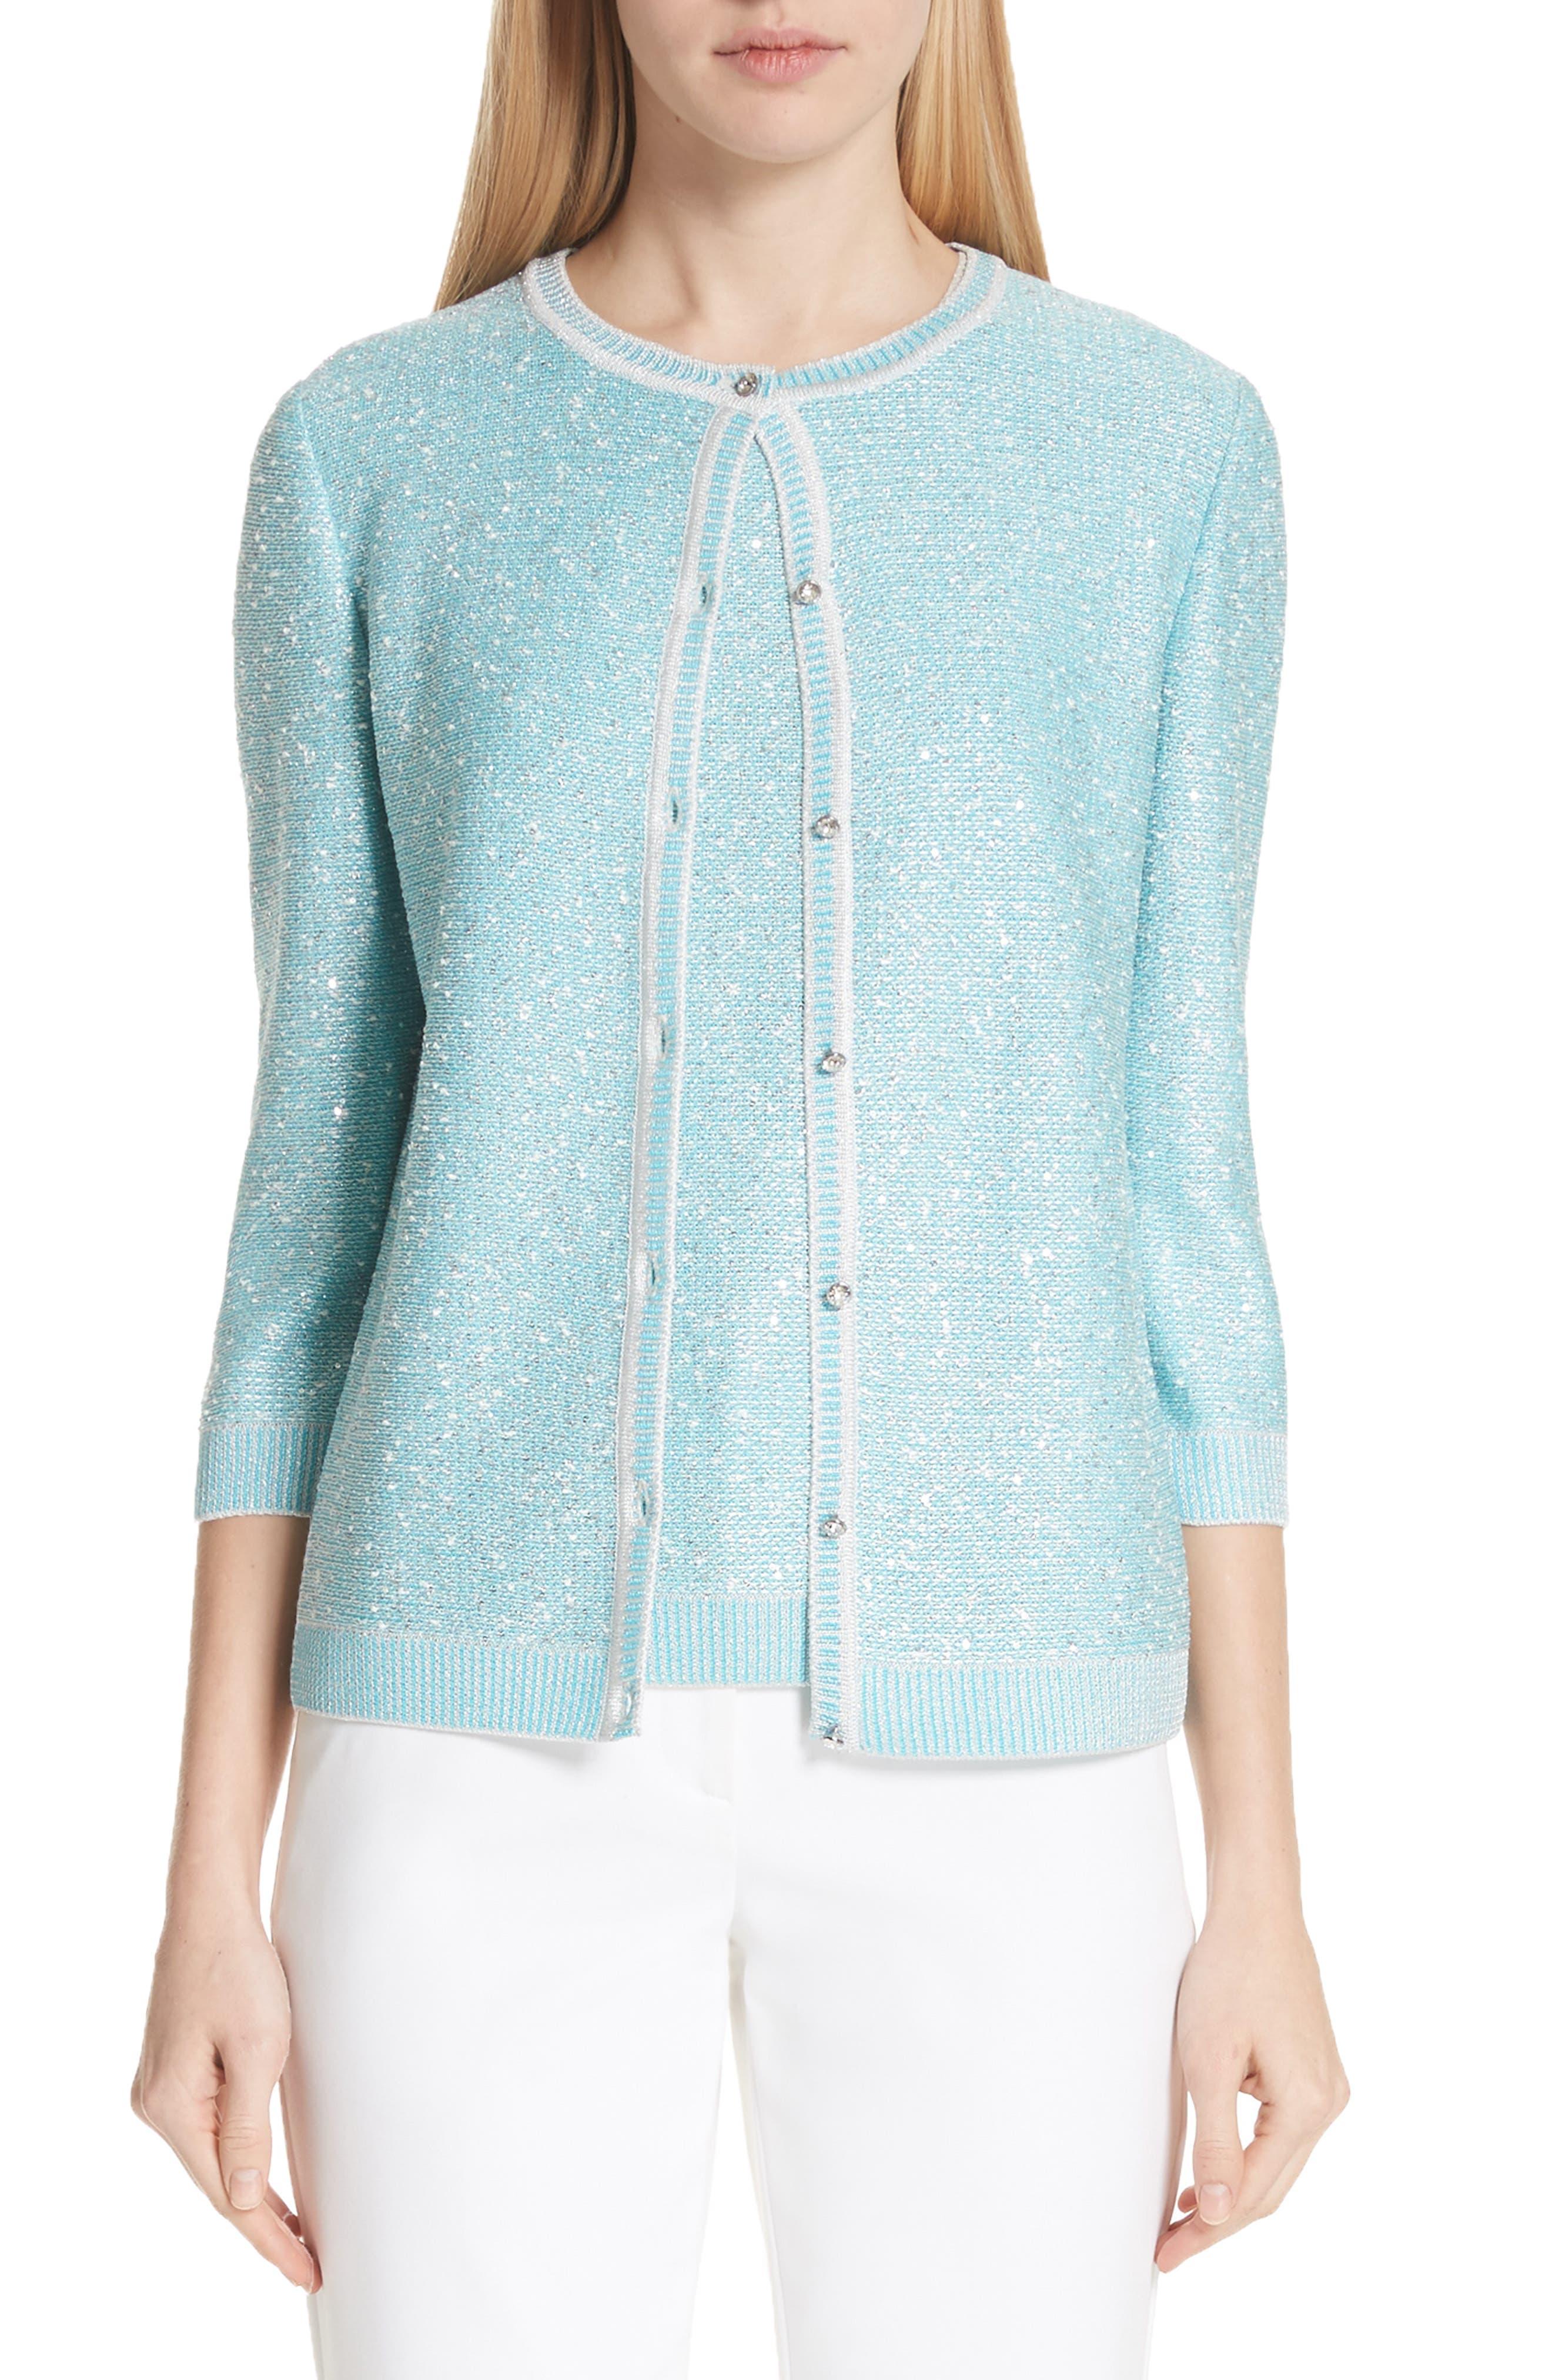 Flecked Sparkle Knit Cardigan,                             Main thumbnail 1, color,                             400